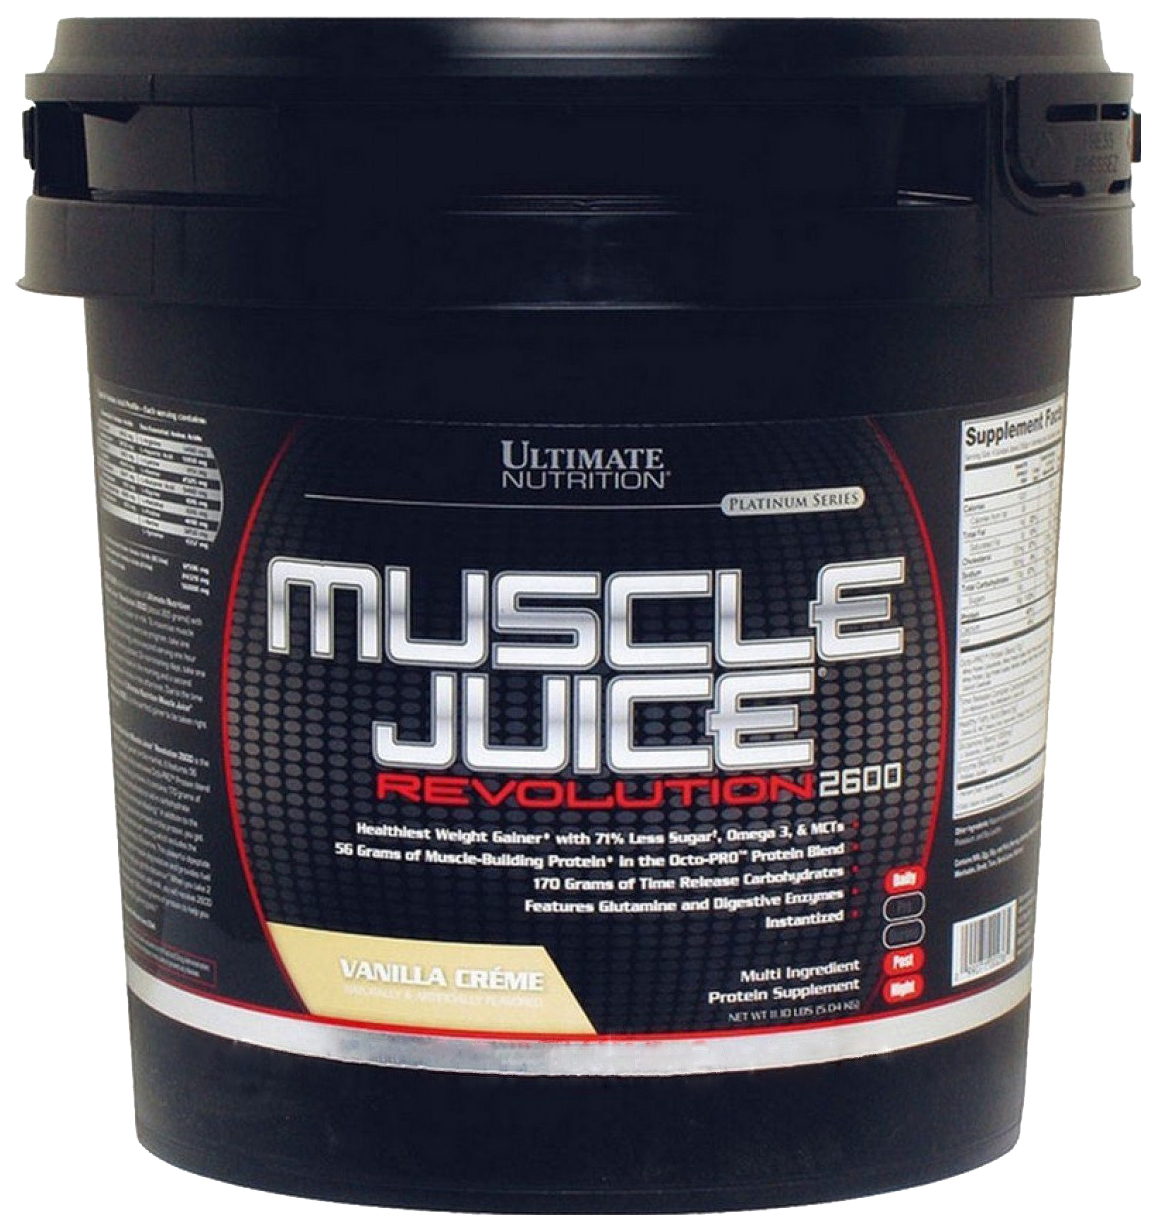 Muscle juice revolution 2600 от ultimate nutrition